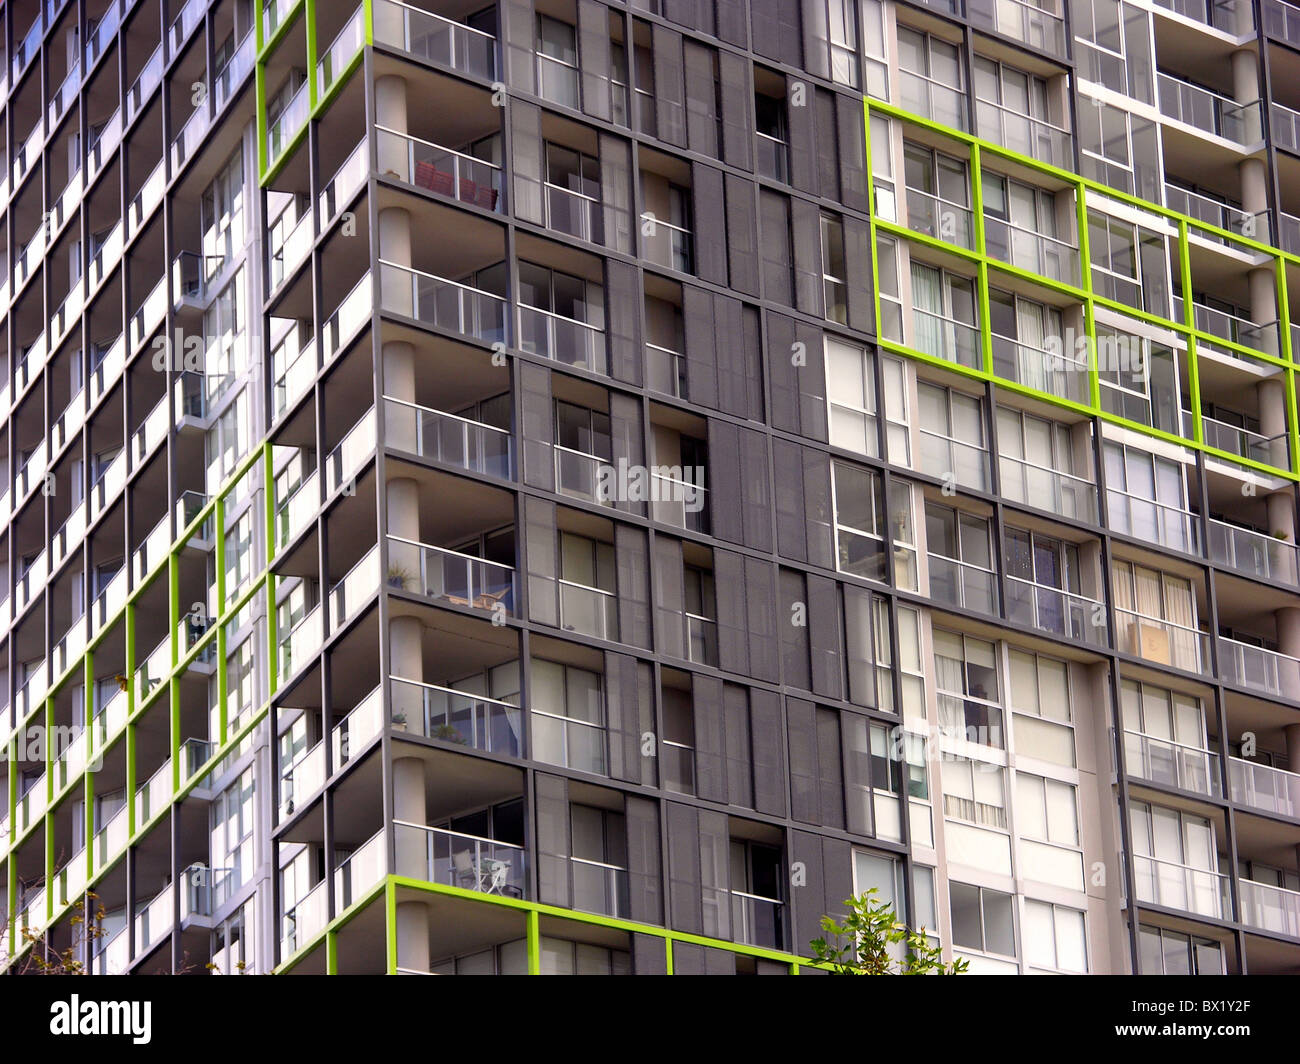 highrise towerblock multistory High-rise building floors floors apartments residential block facade living - Stock Image